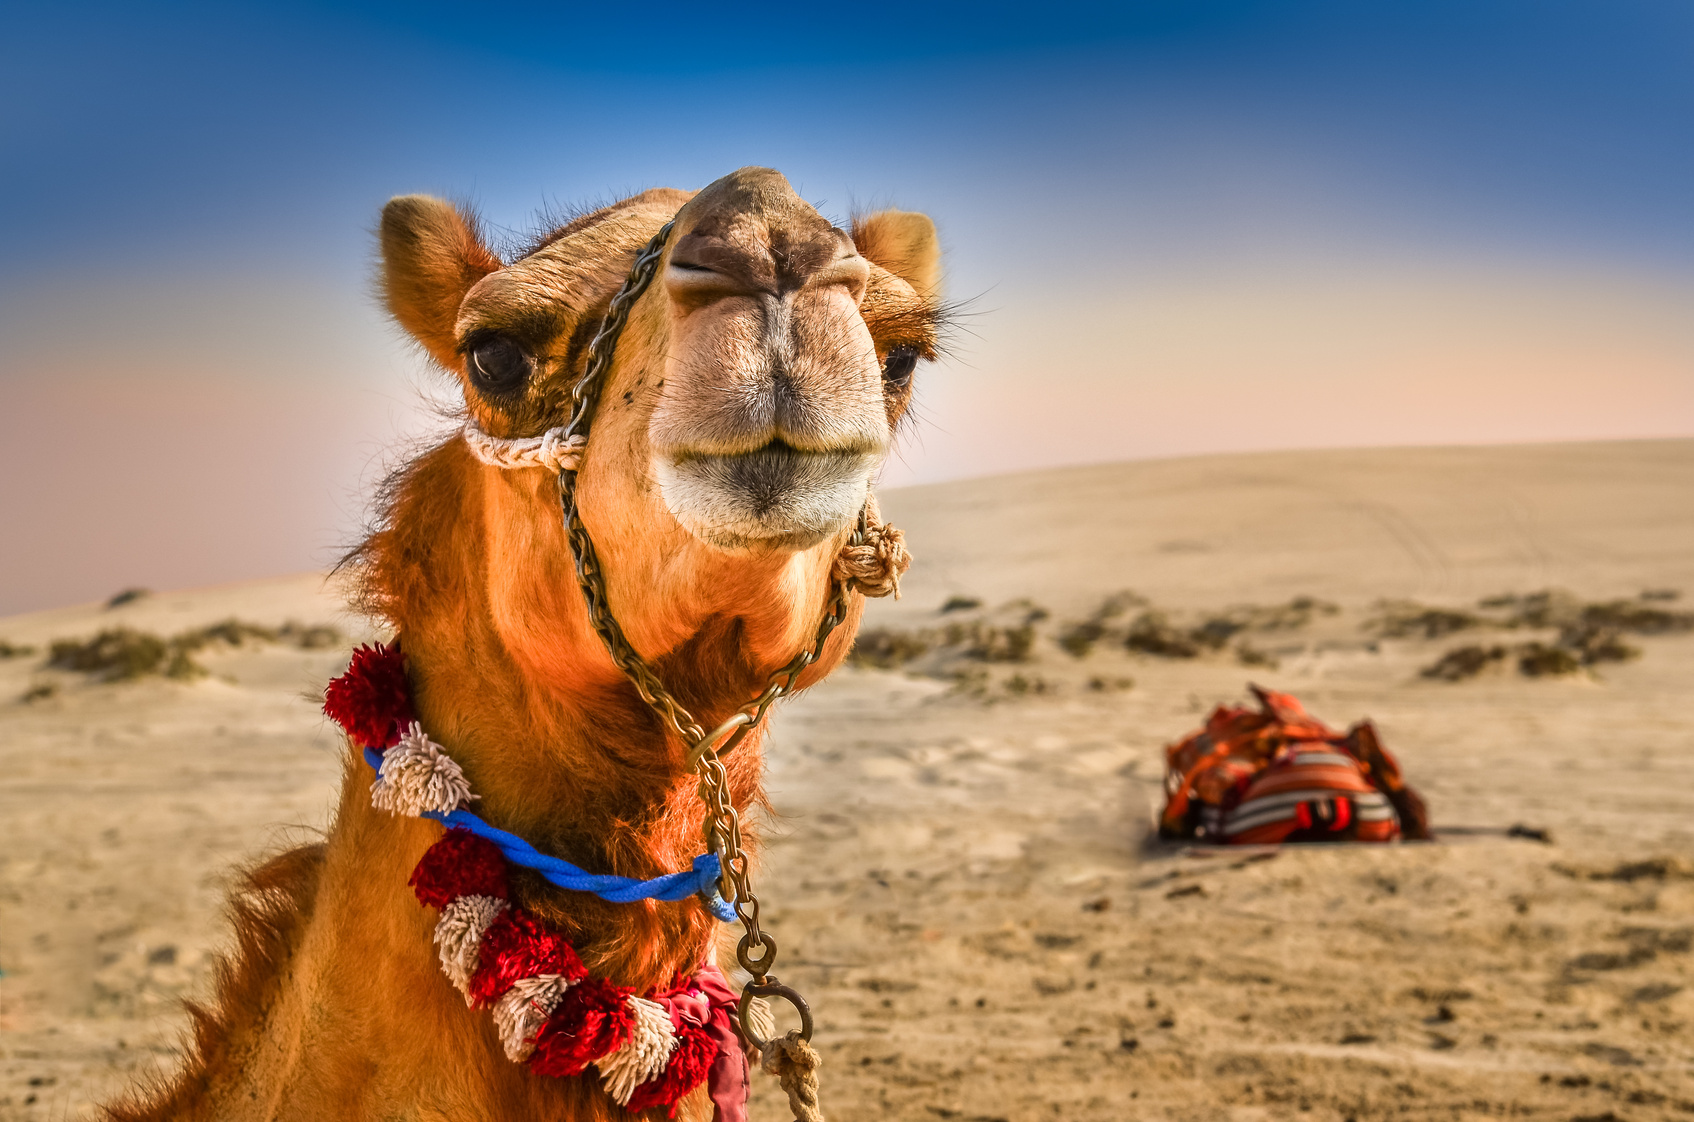 196gypten 1 woche all inclusive im 4 hotel albatros nur 324